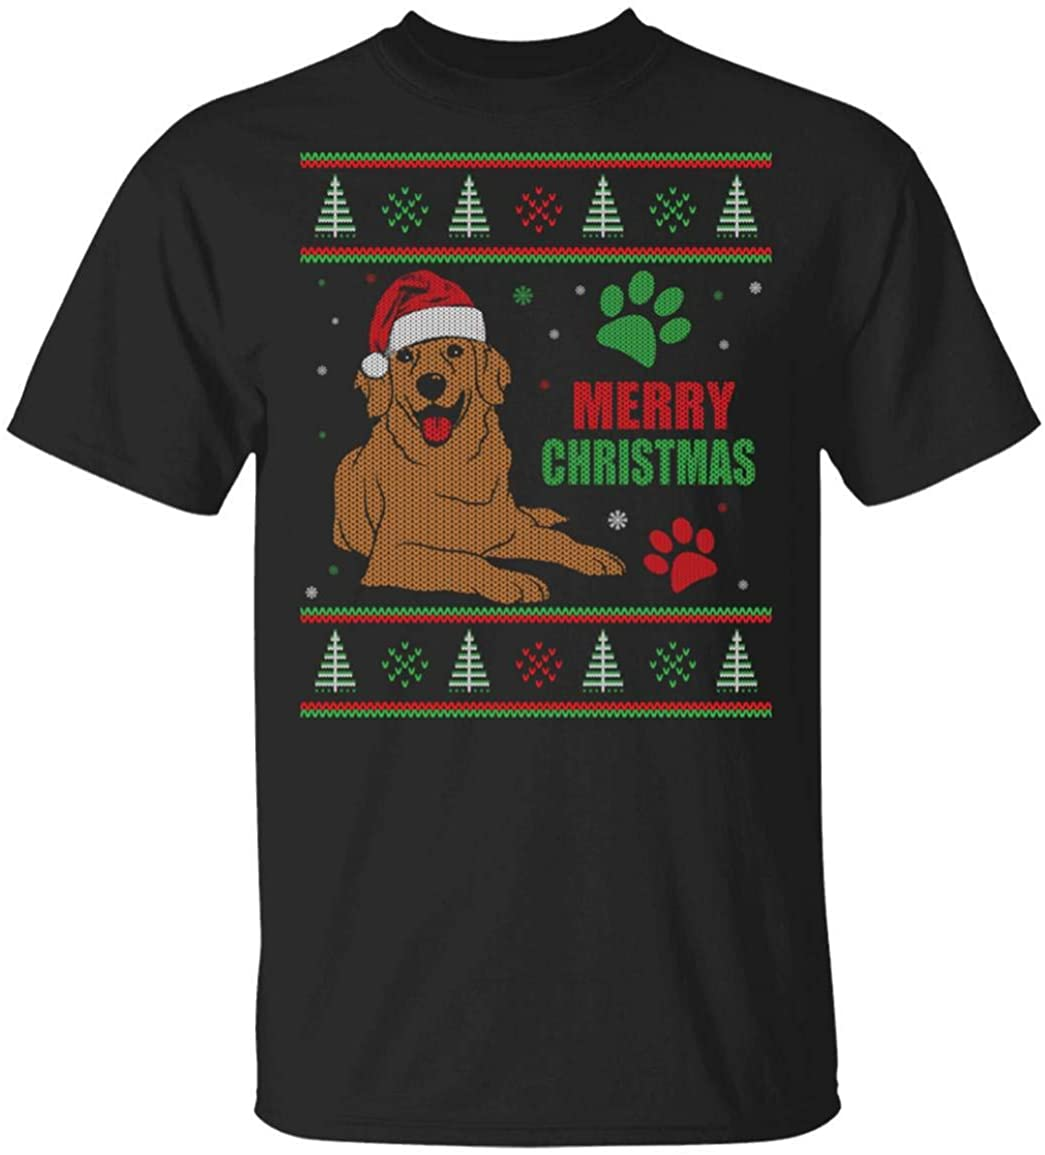 Golden Retriever Ugly Christmas T-Shirt for Christmas Hoodie Sweatershirt Custom